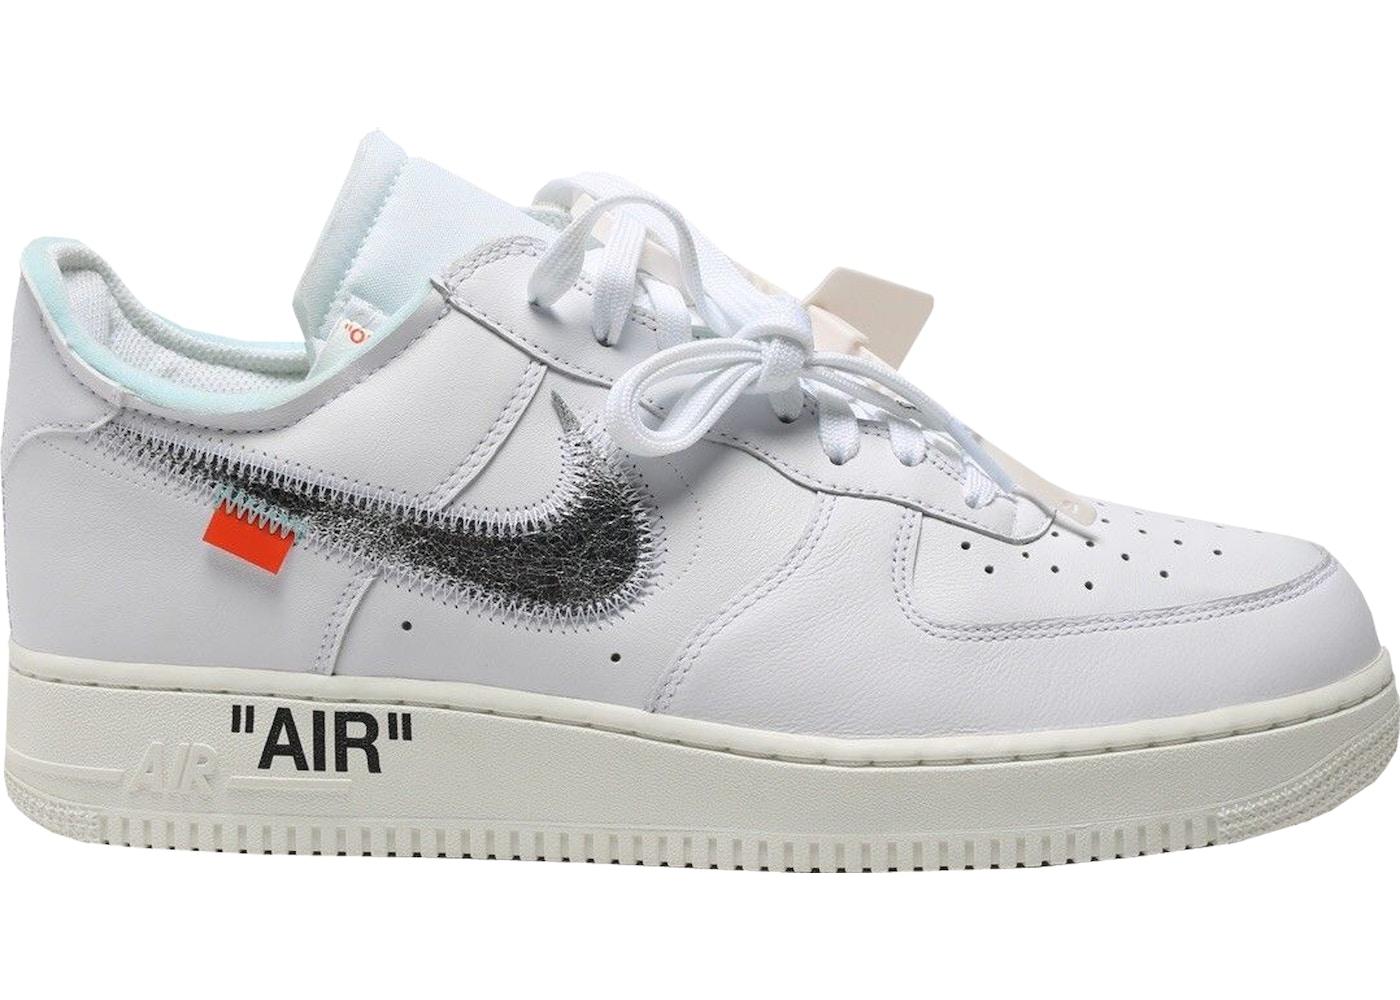 classic fit 72c49 b5e16 Size 12 Shoes - Price Premium